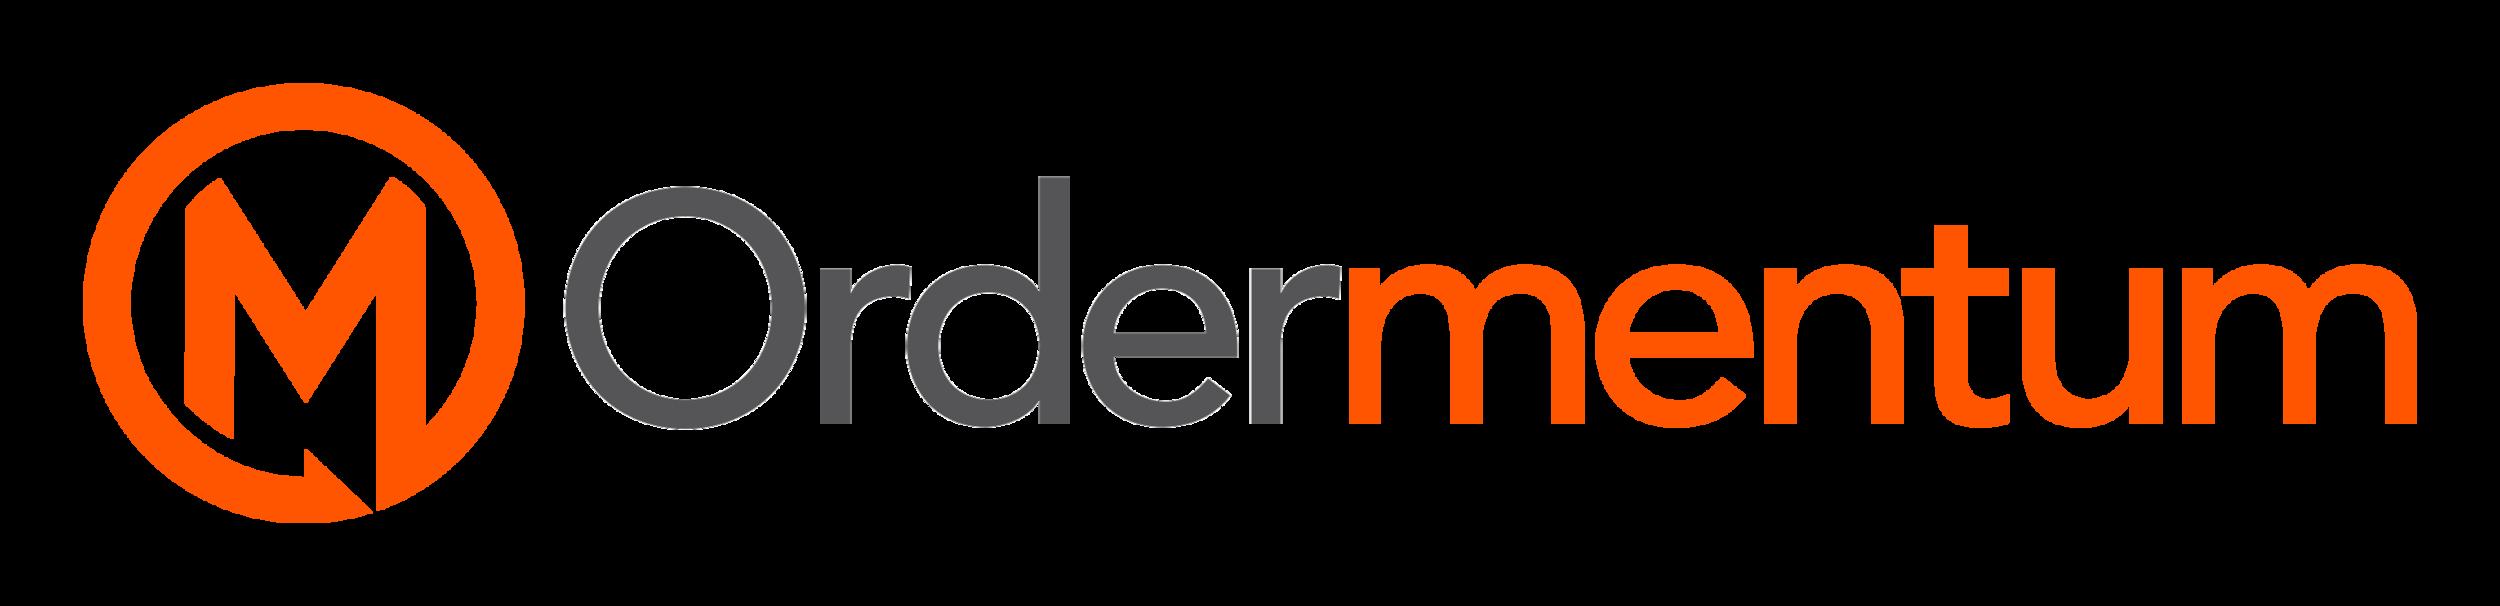 Dark-Full-Logo.png